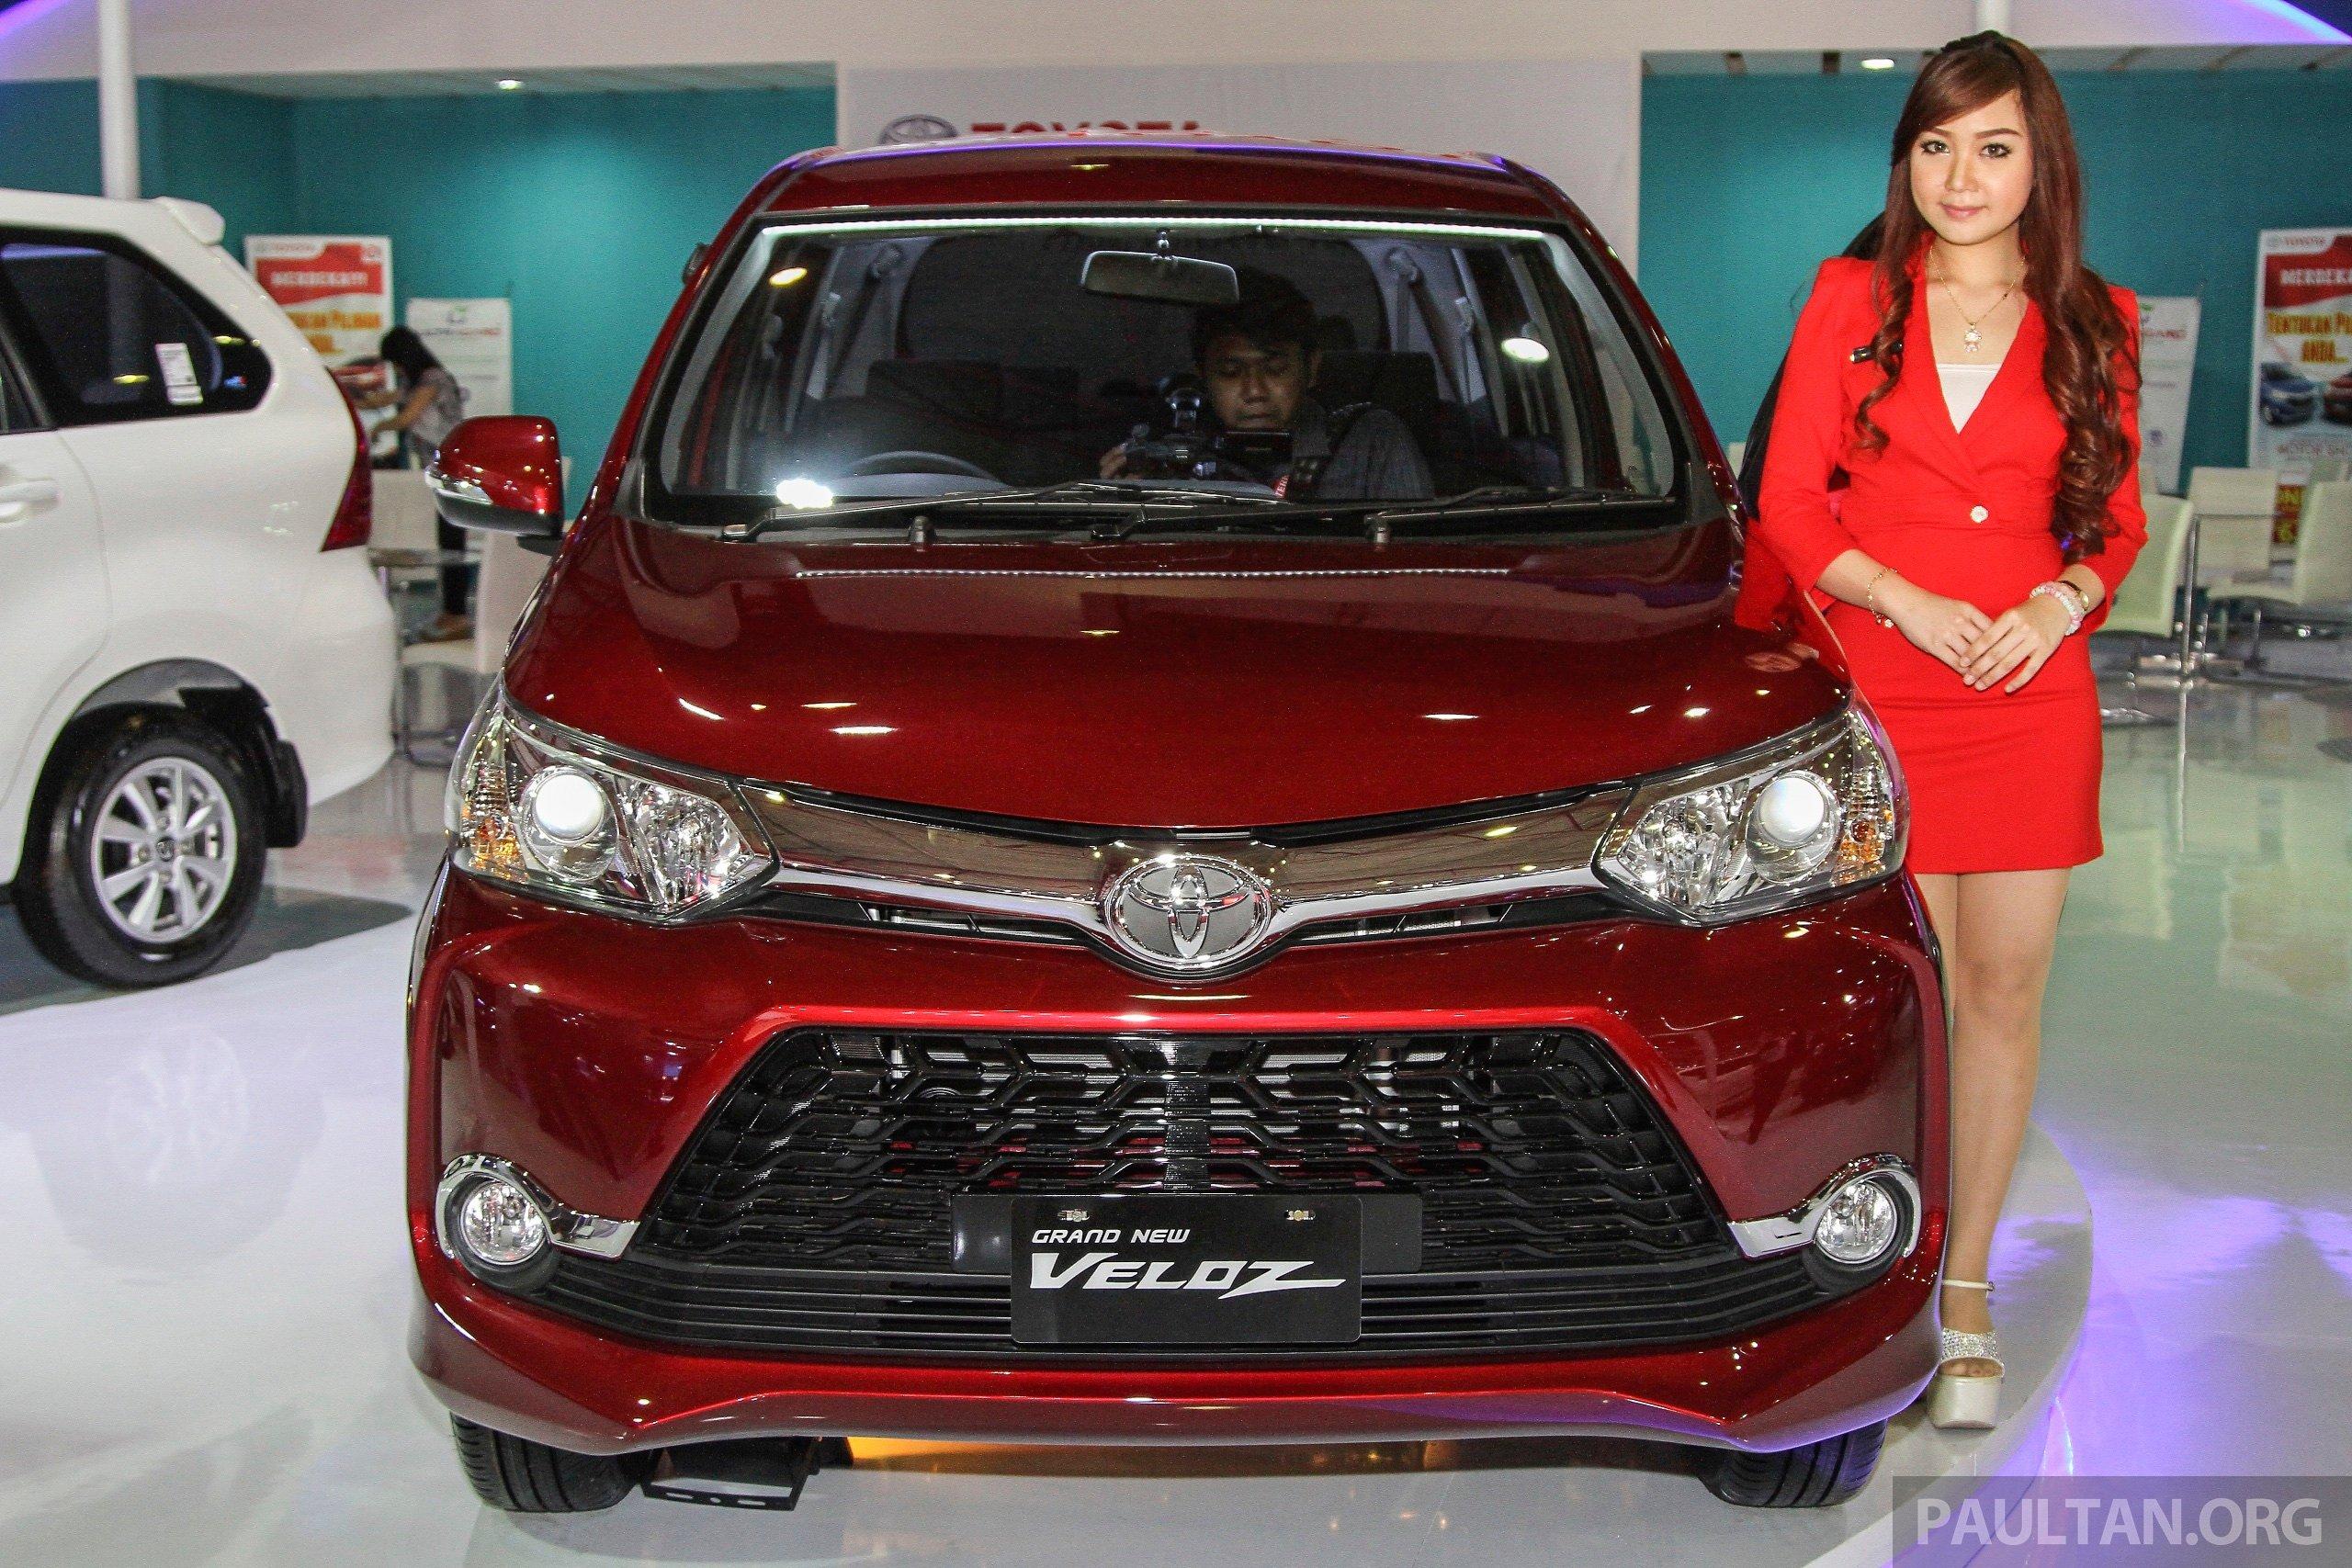 Toyota-Avanza-Veloz-facelift-1.jpg